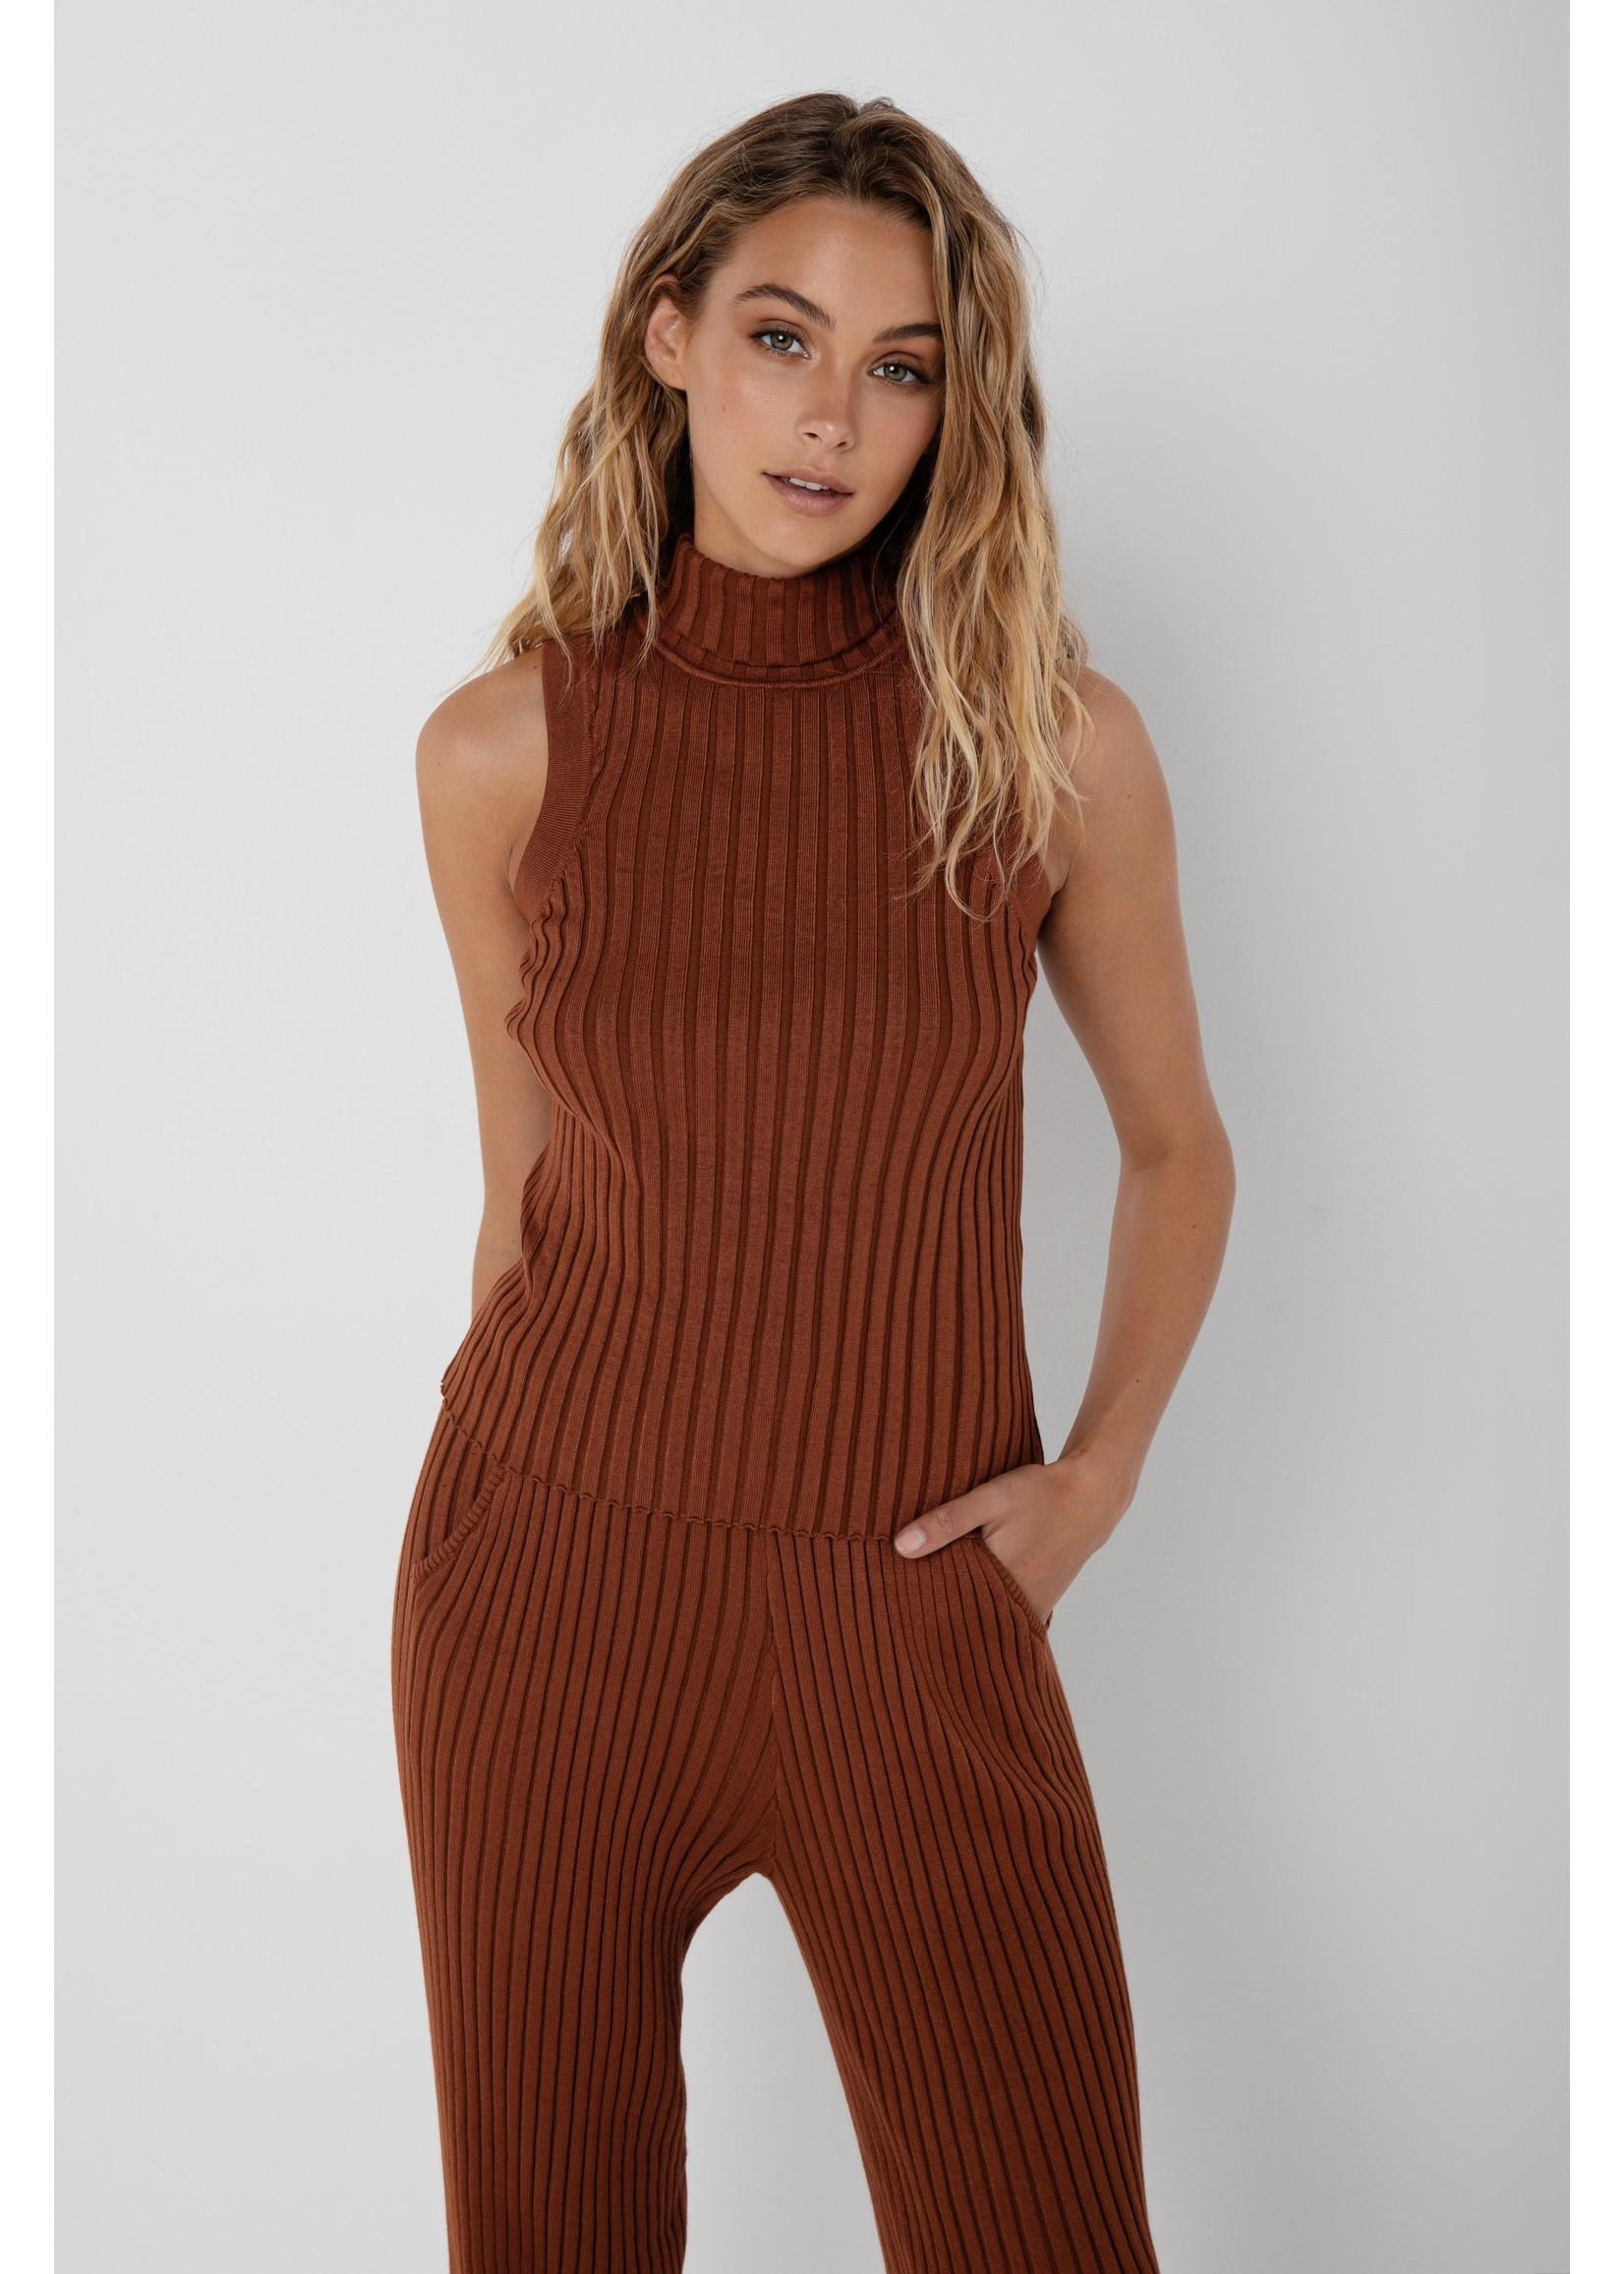 Madison the Label Gabbi Knit Top